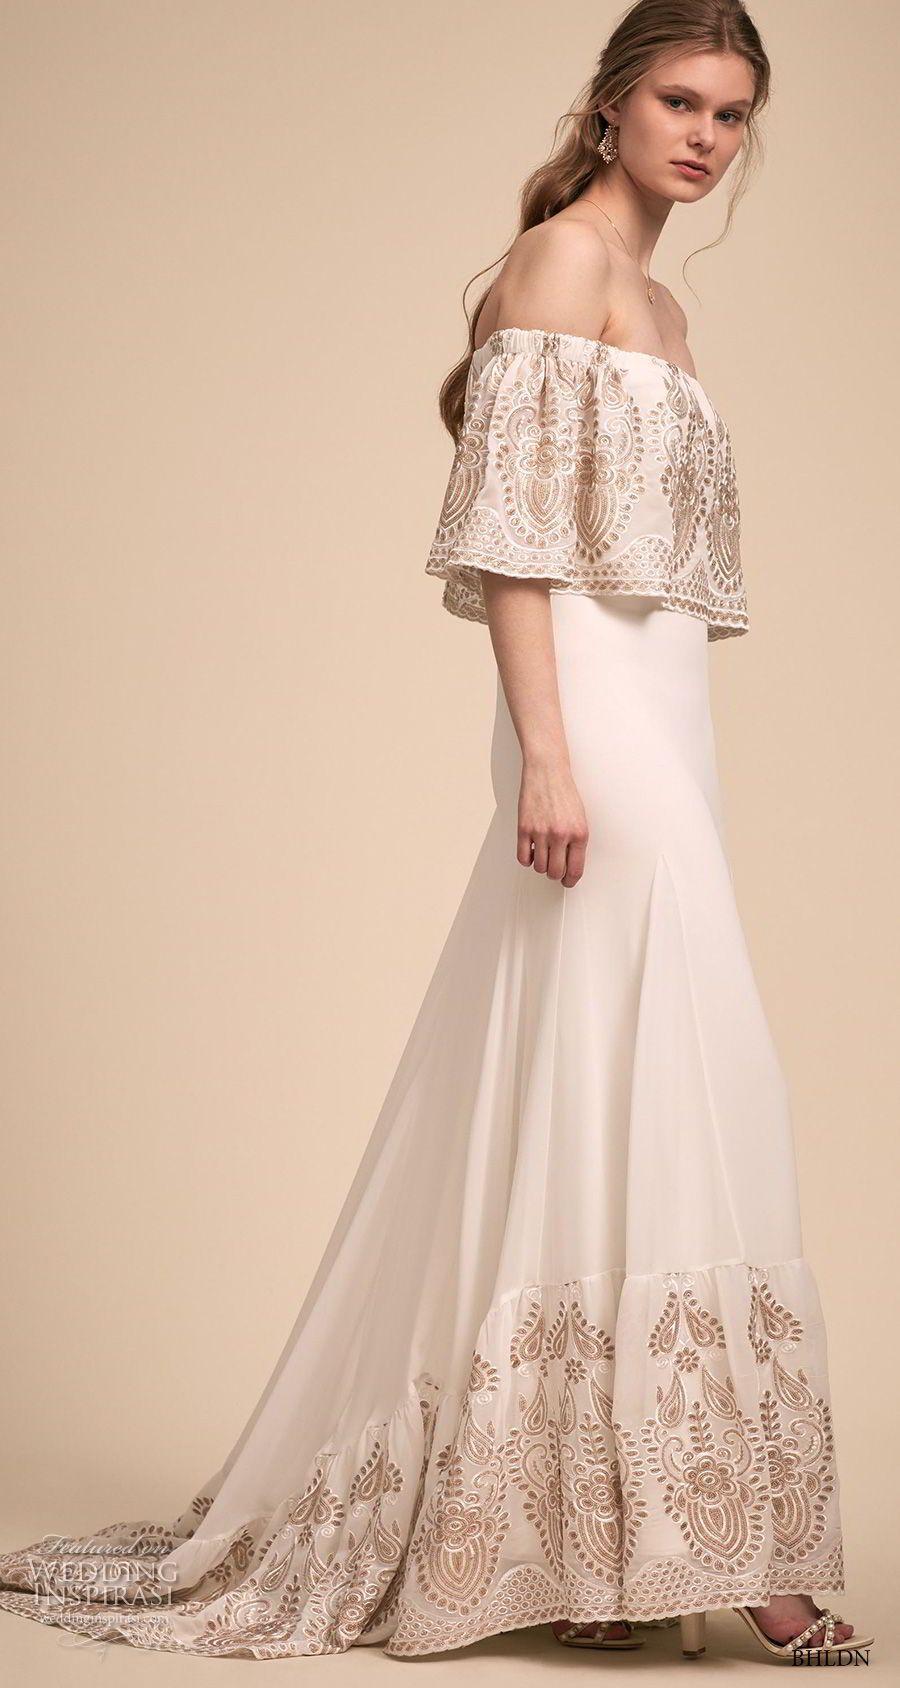 T-length lace wedding dresses november 2018 BHLDNus Designer Collective Exclusive Wedding Dresses u from the